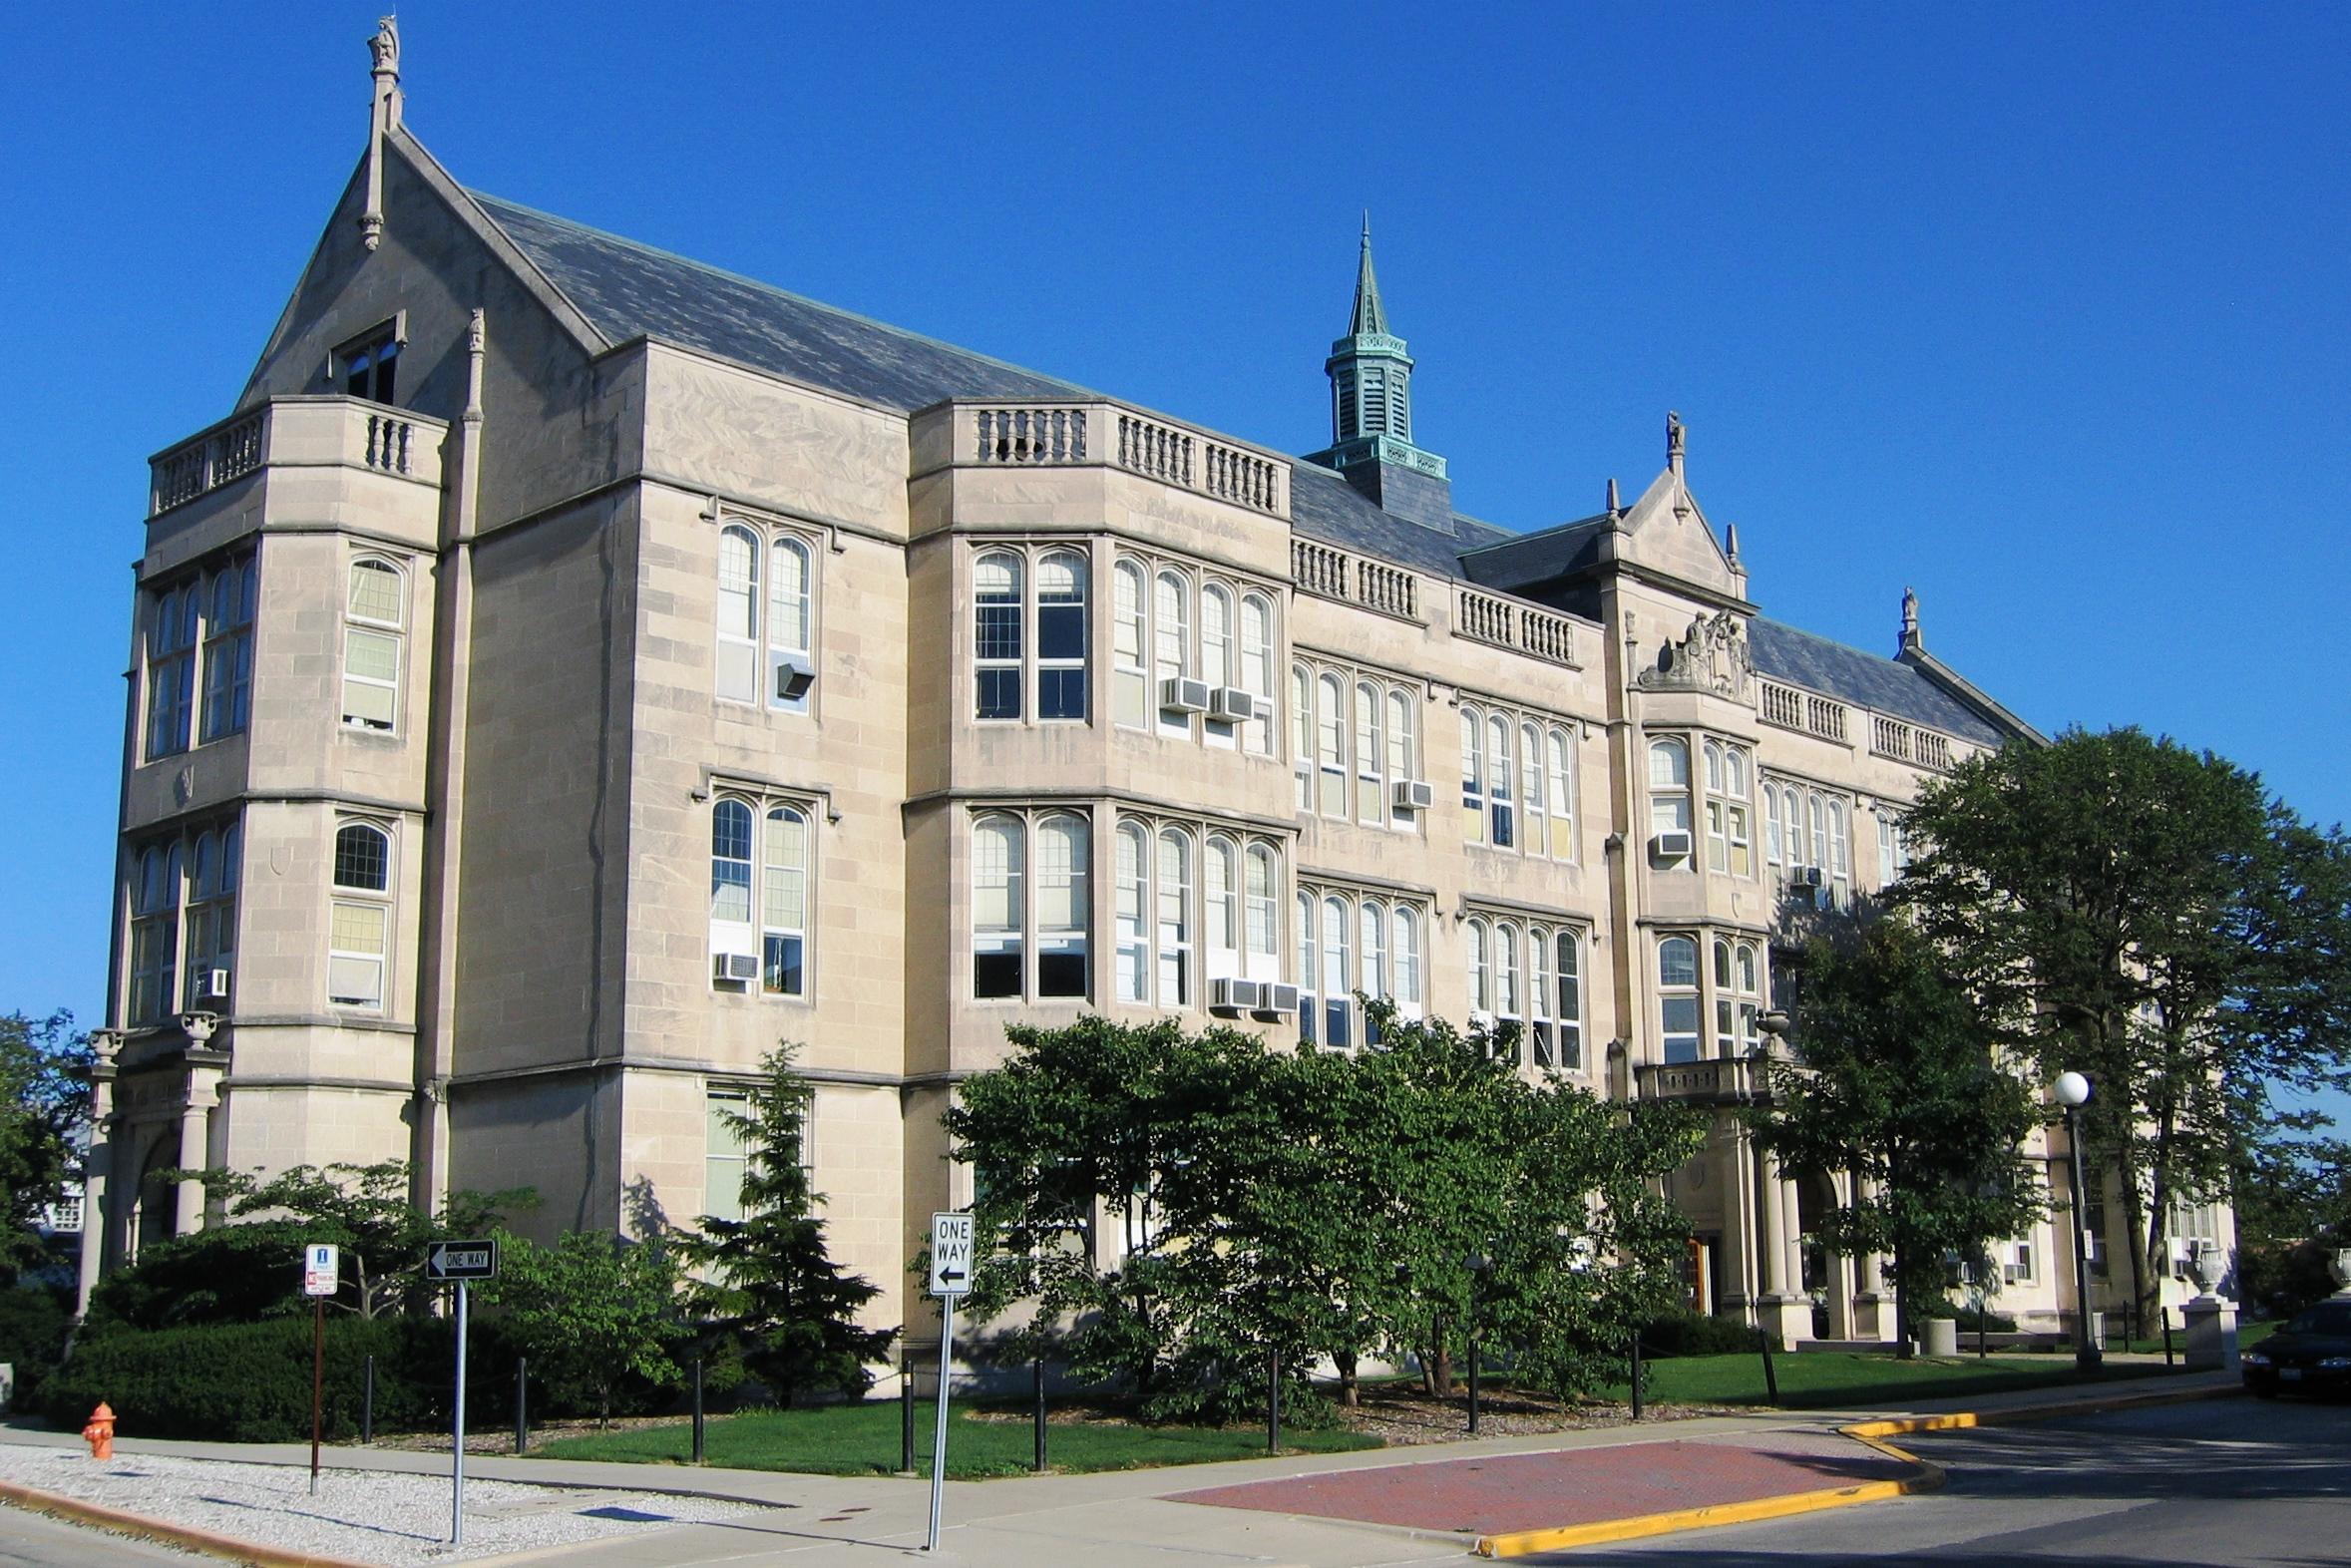 File:Uni High Urbana illinois.jpg - Wikipedia